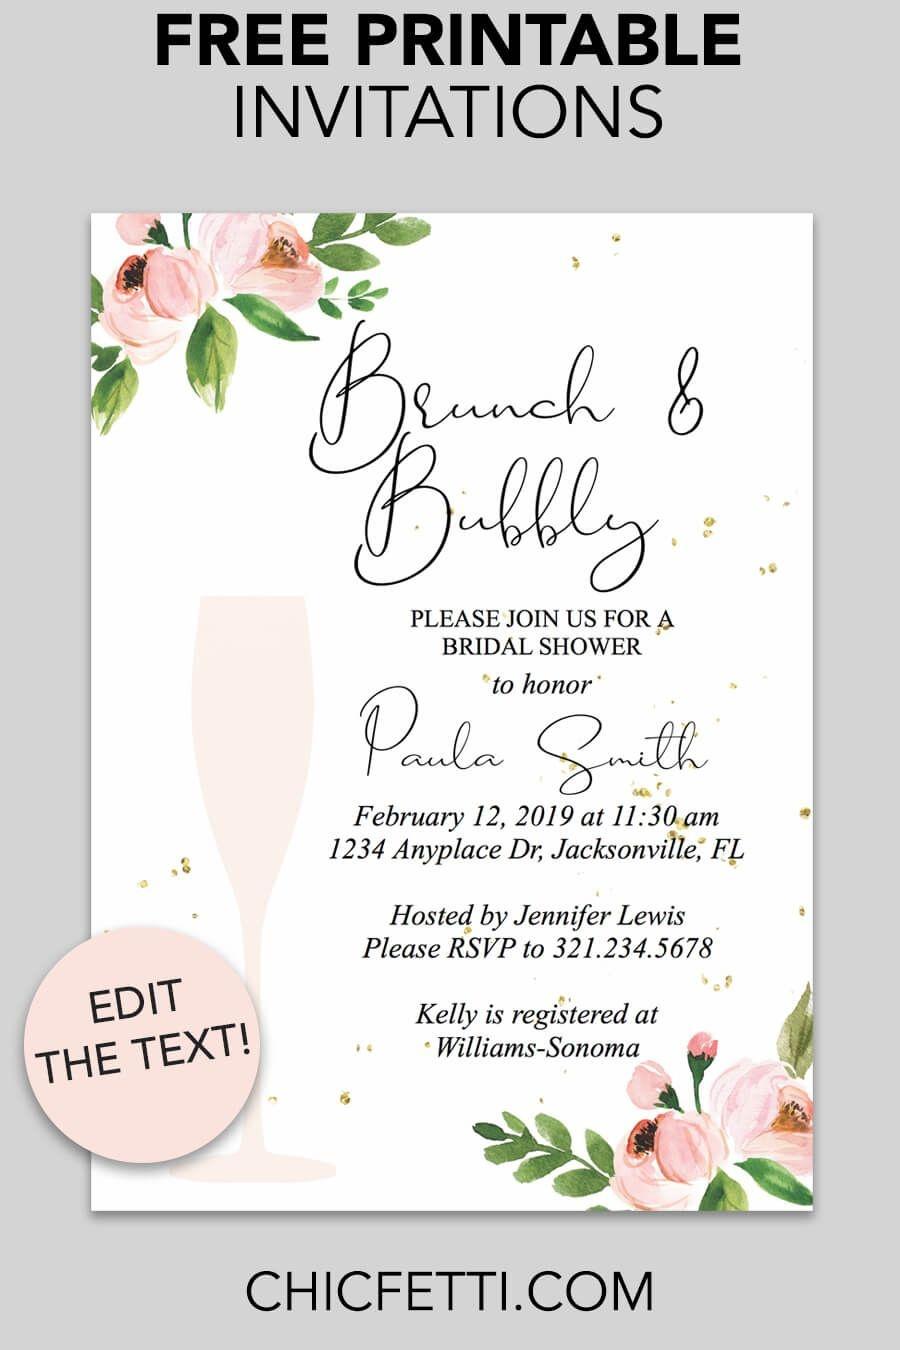 Bridal Shower Printable Invitation (Floral Bubbly | Invitations - Free Printable Bridal Shower Invitations Templates